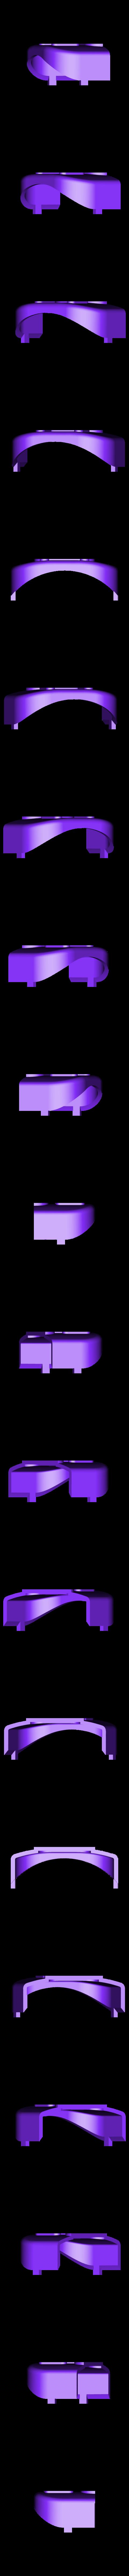 Sandbox_Front-Part_1_-_SCALED-B.STL Download free STL file 4-8-8-4 Big Boy Locomotive • 3D printer object, RaymondDeLuca